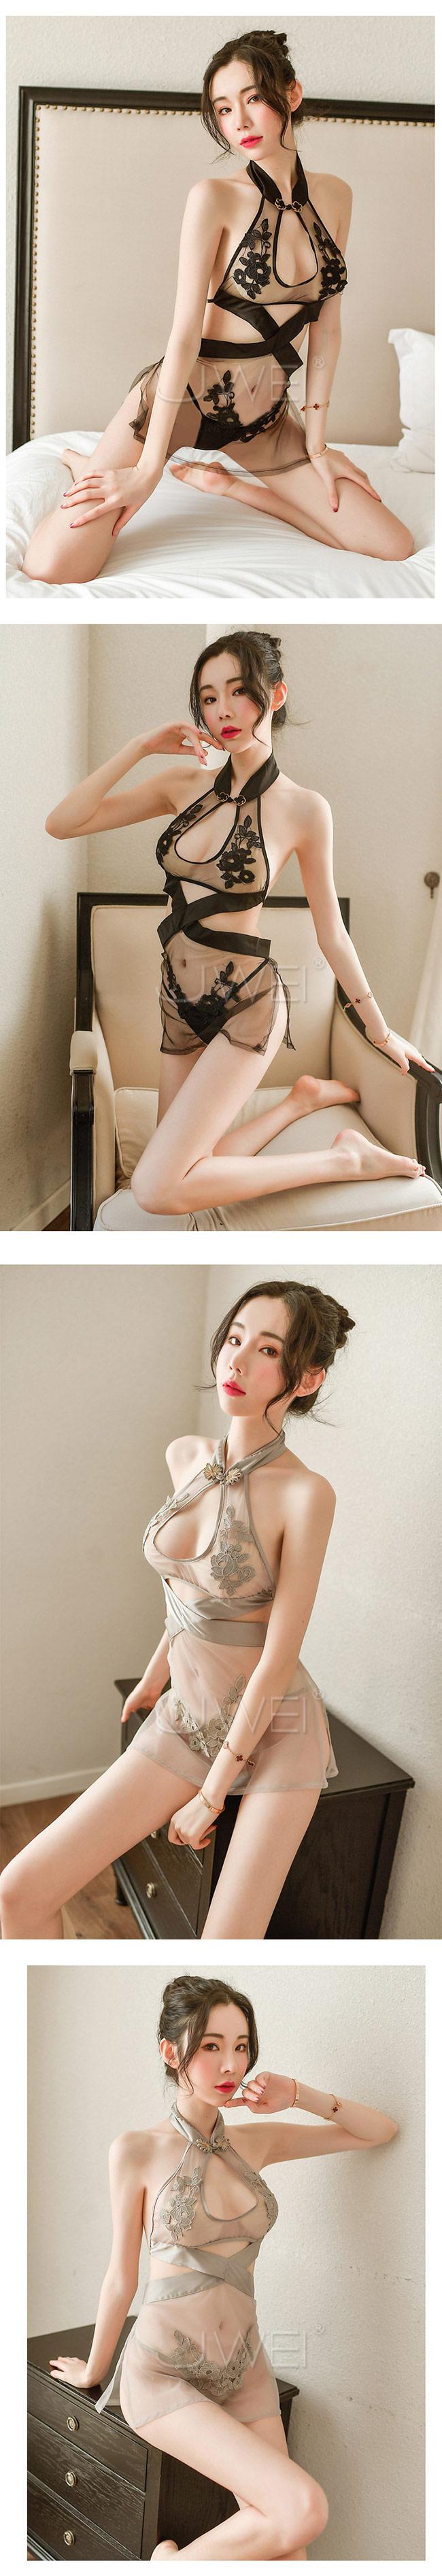 旗袍 cosplay